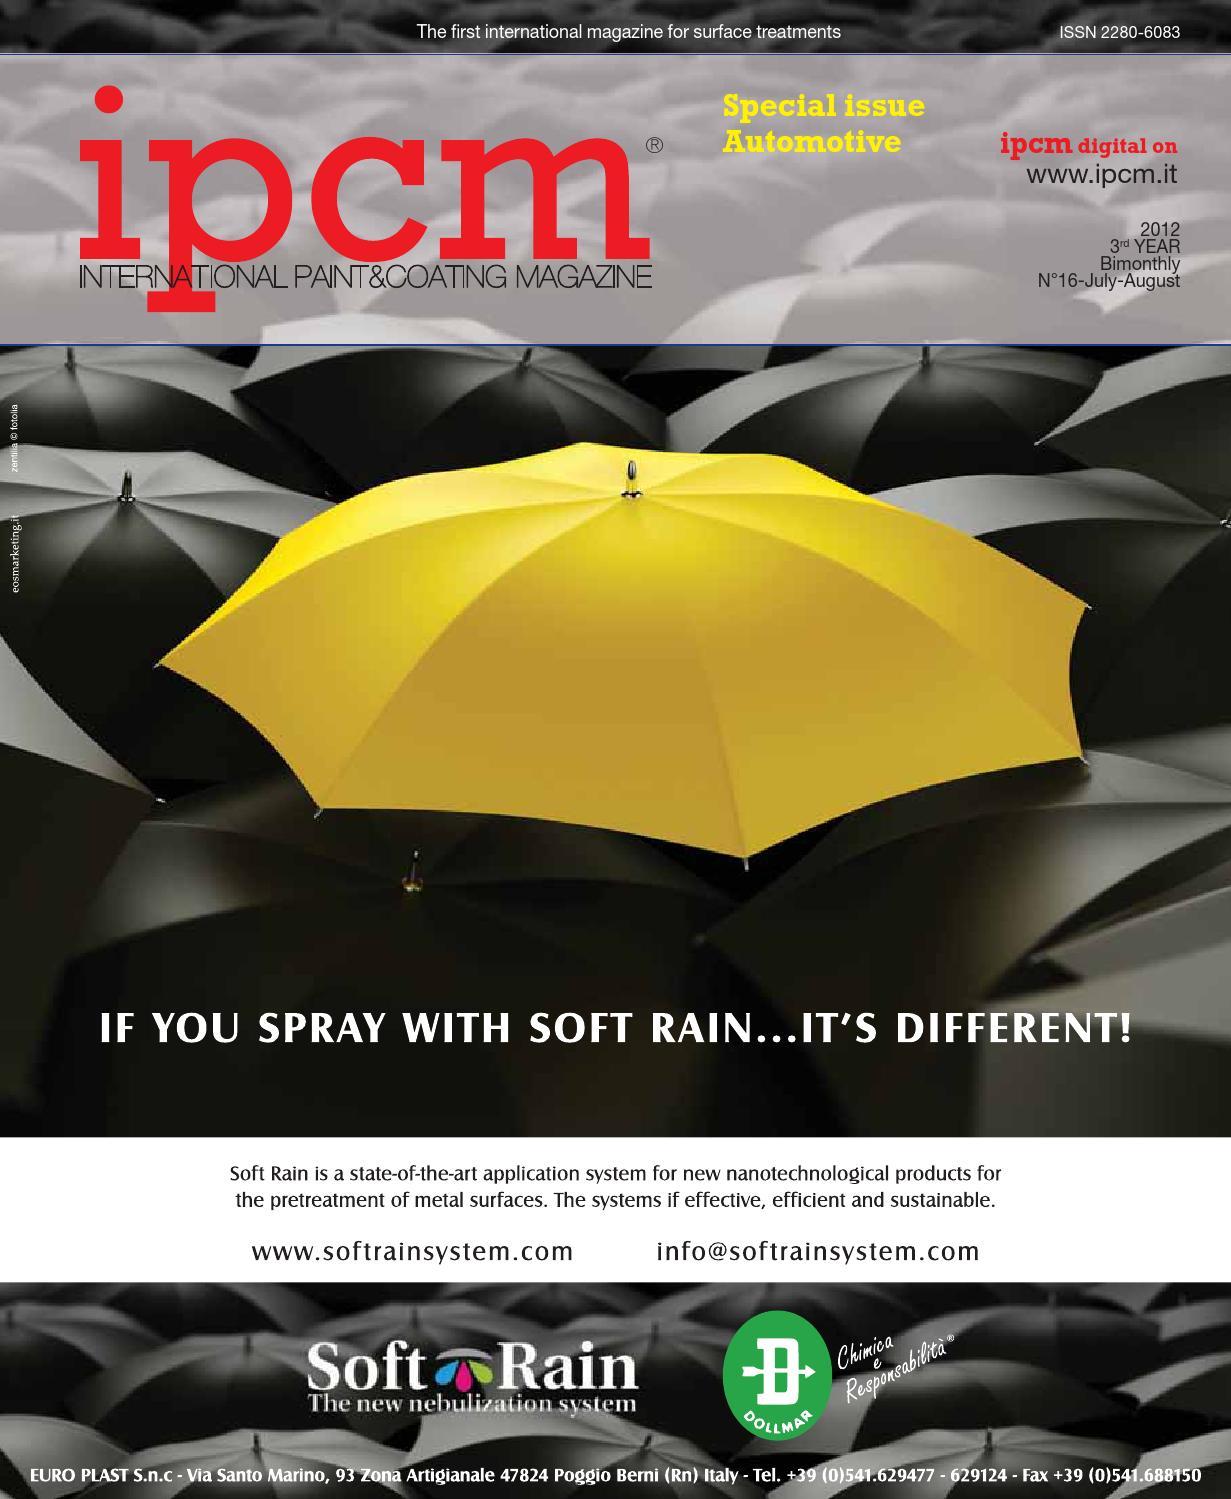 ipcm® 2012 n. 16 by ipcm® International Paint Coating Magazine - issuu 98e34eff1b4